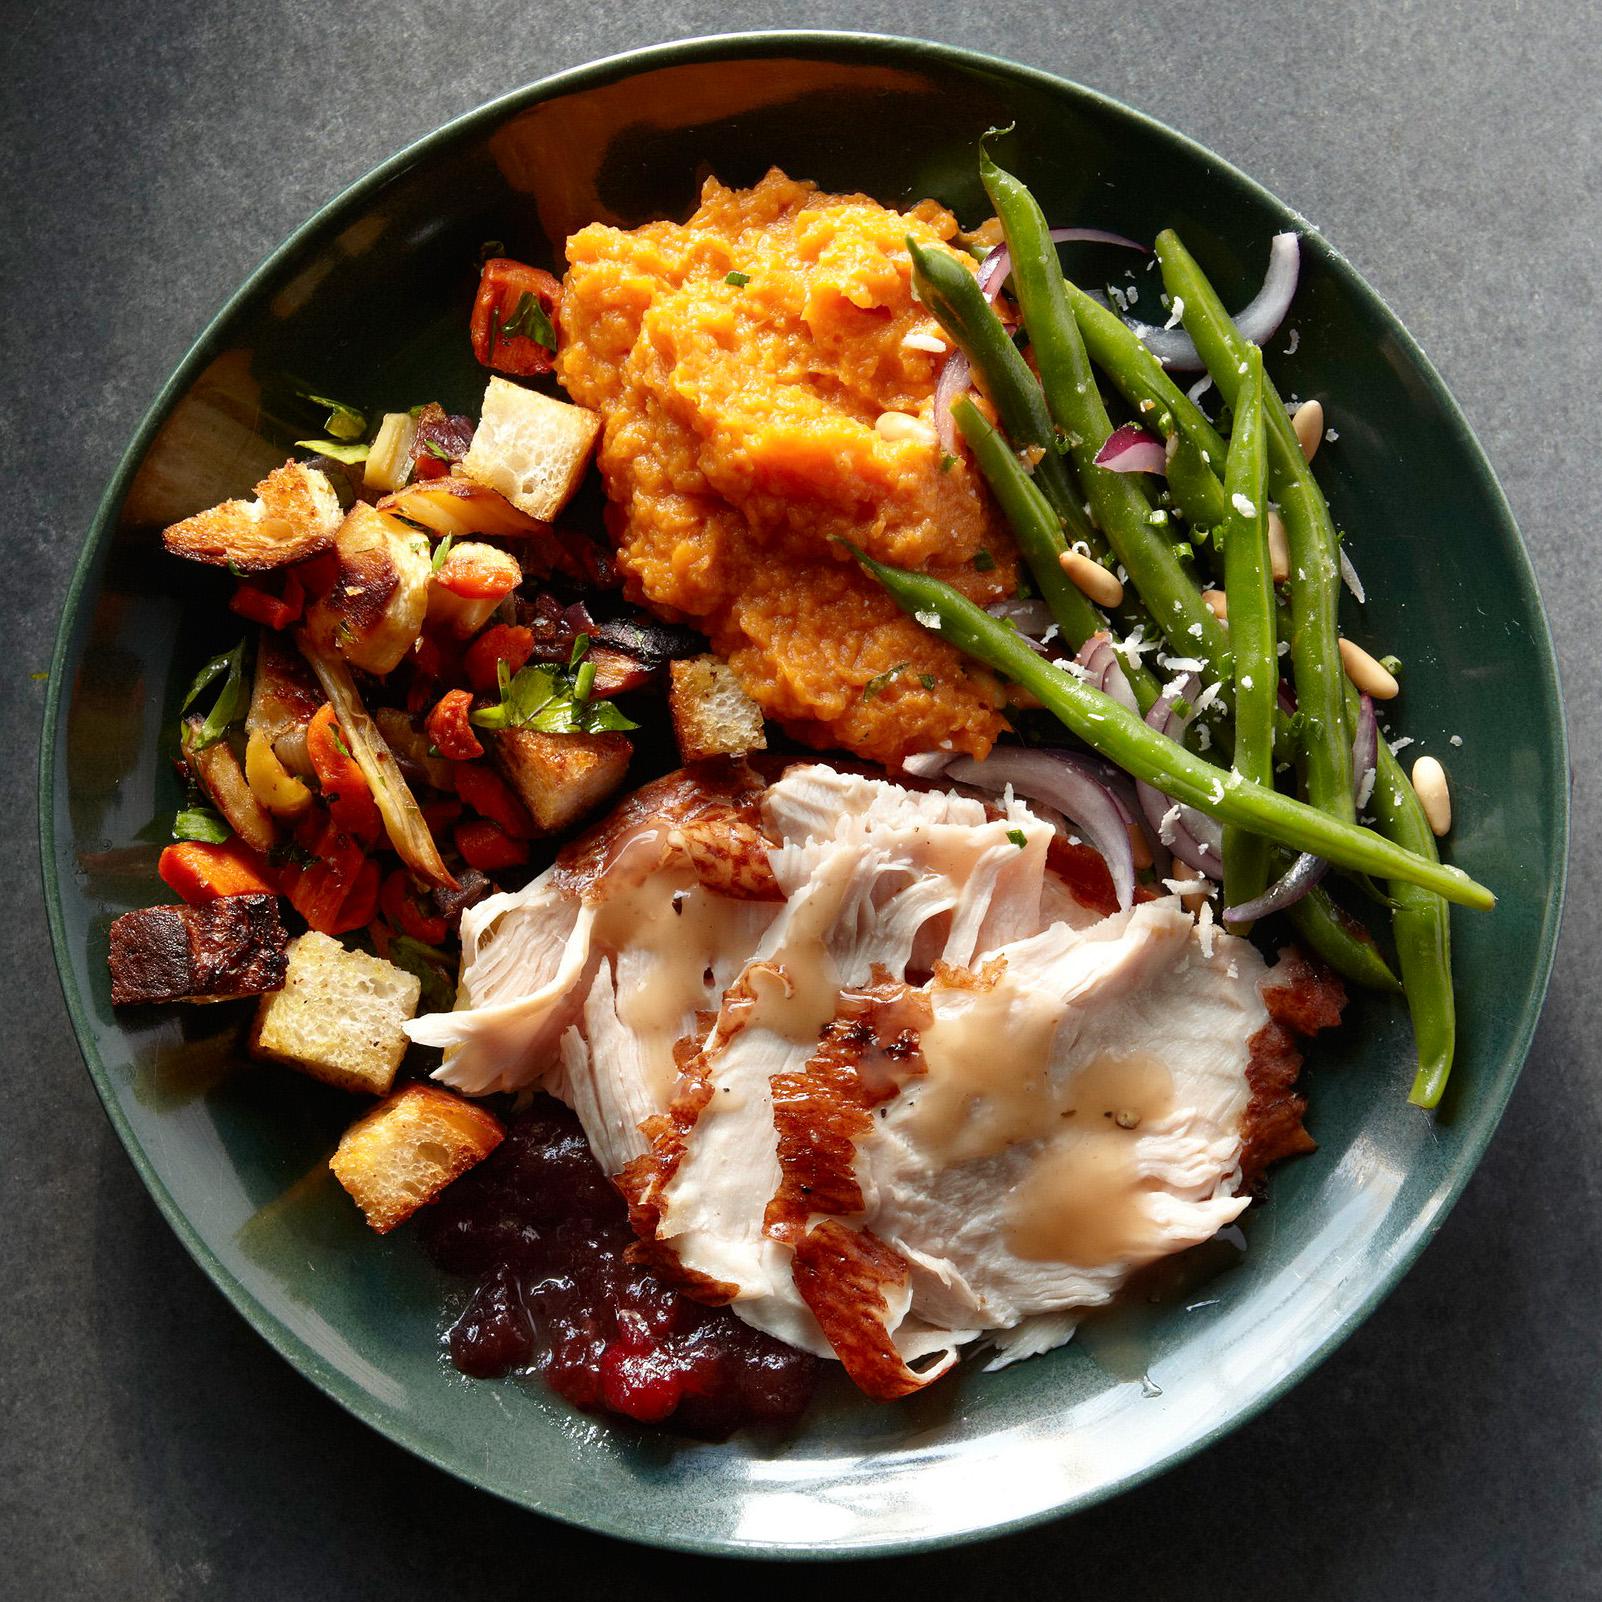 stuffing, turkey, green beans, sweet potatoes on plate